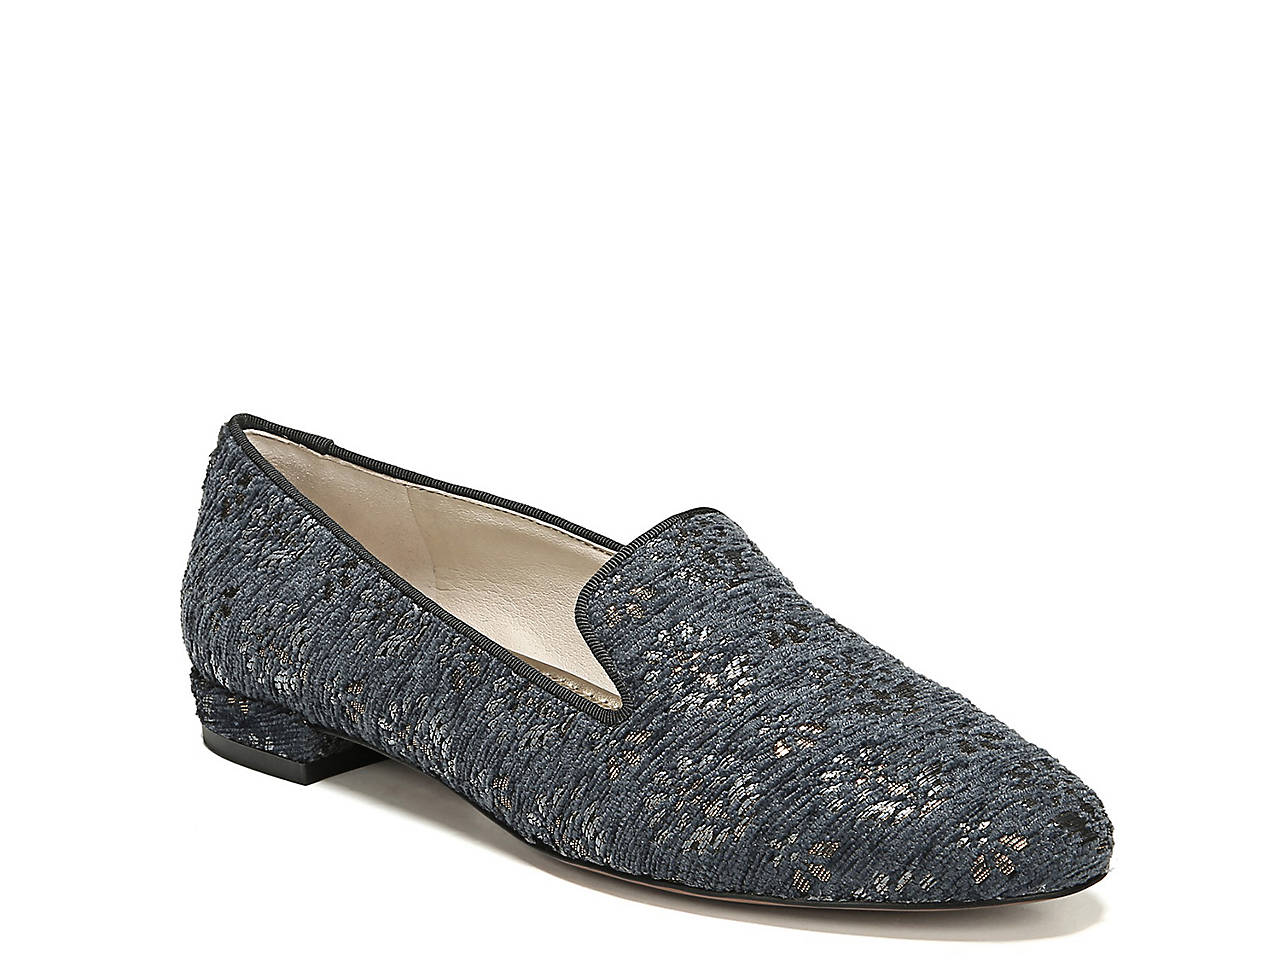 50e7d86fbfc Sam Edelman Jordy Loafer Women s Shoes